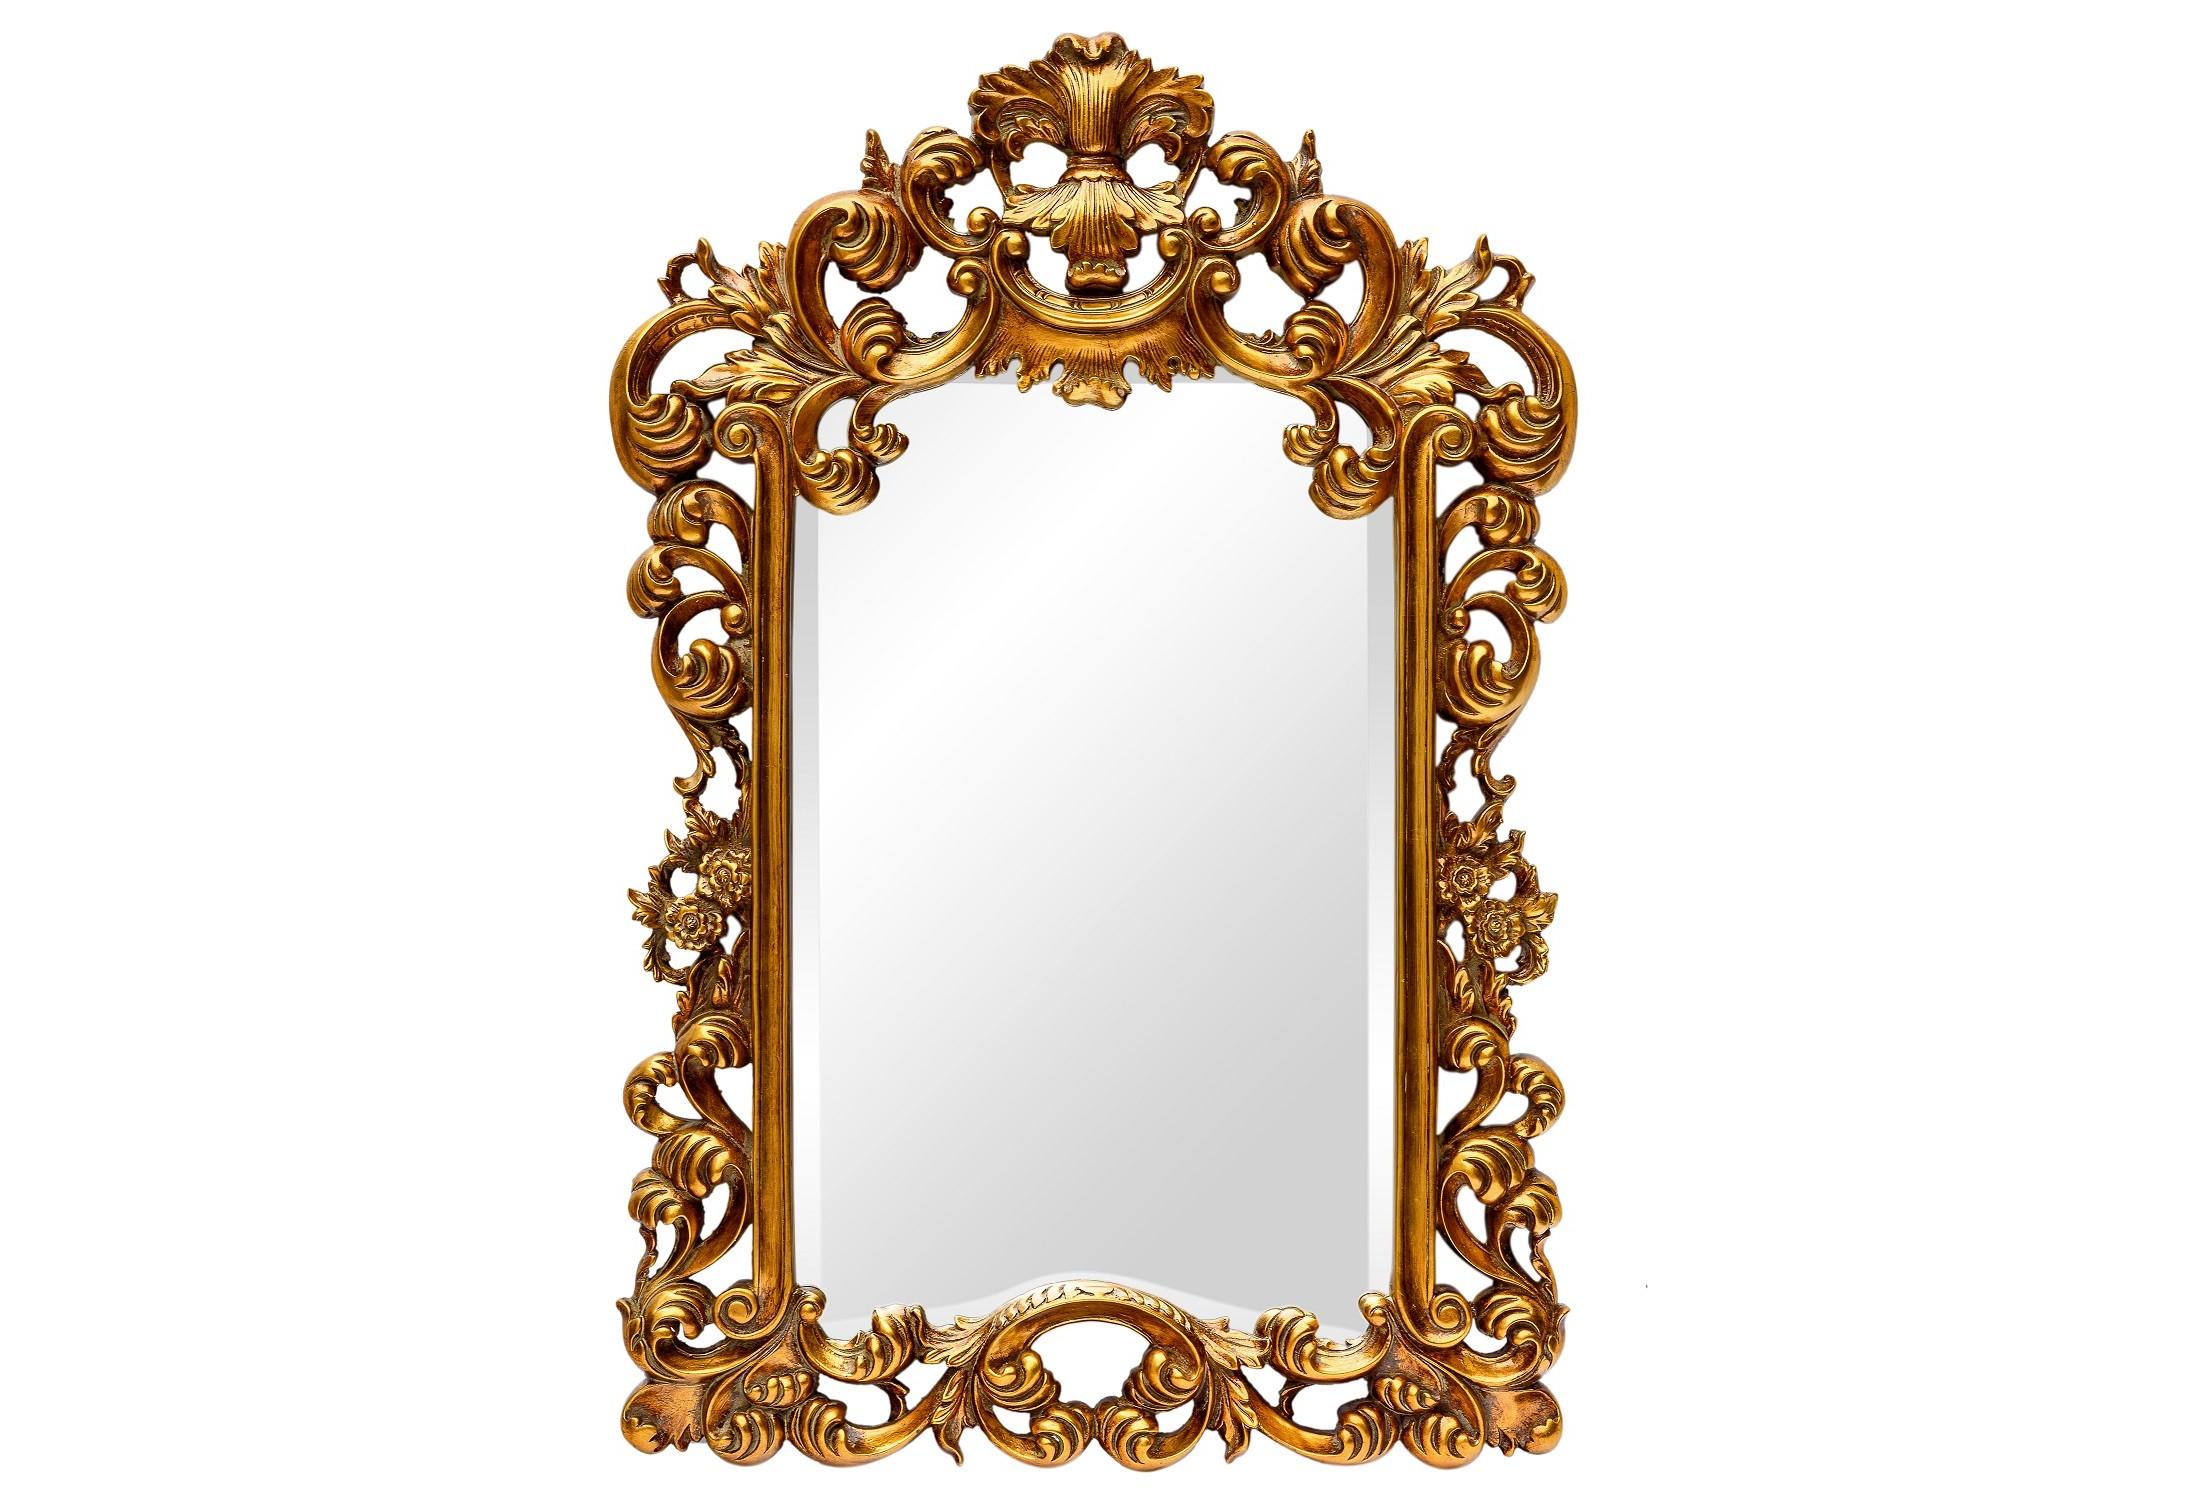 Зеркало Bogeme GoldНастенные зеркала<br><br><br>Material: Пластик<br>Width см: 61<br>Depth см: 4,5<br>Height см: 91,5